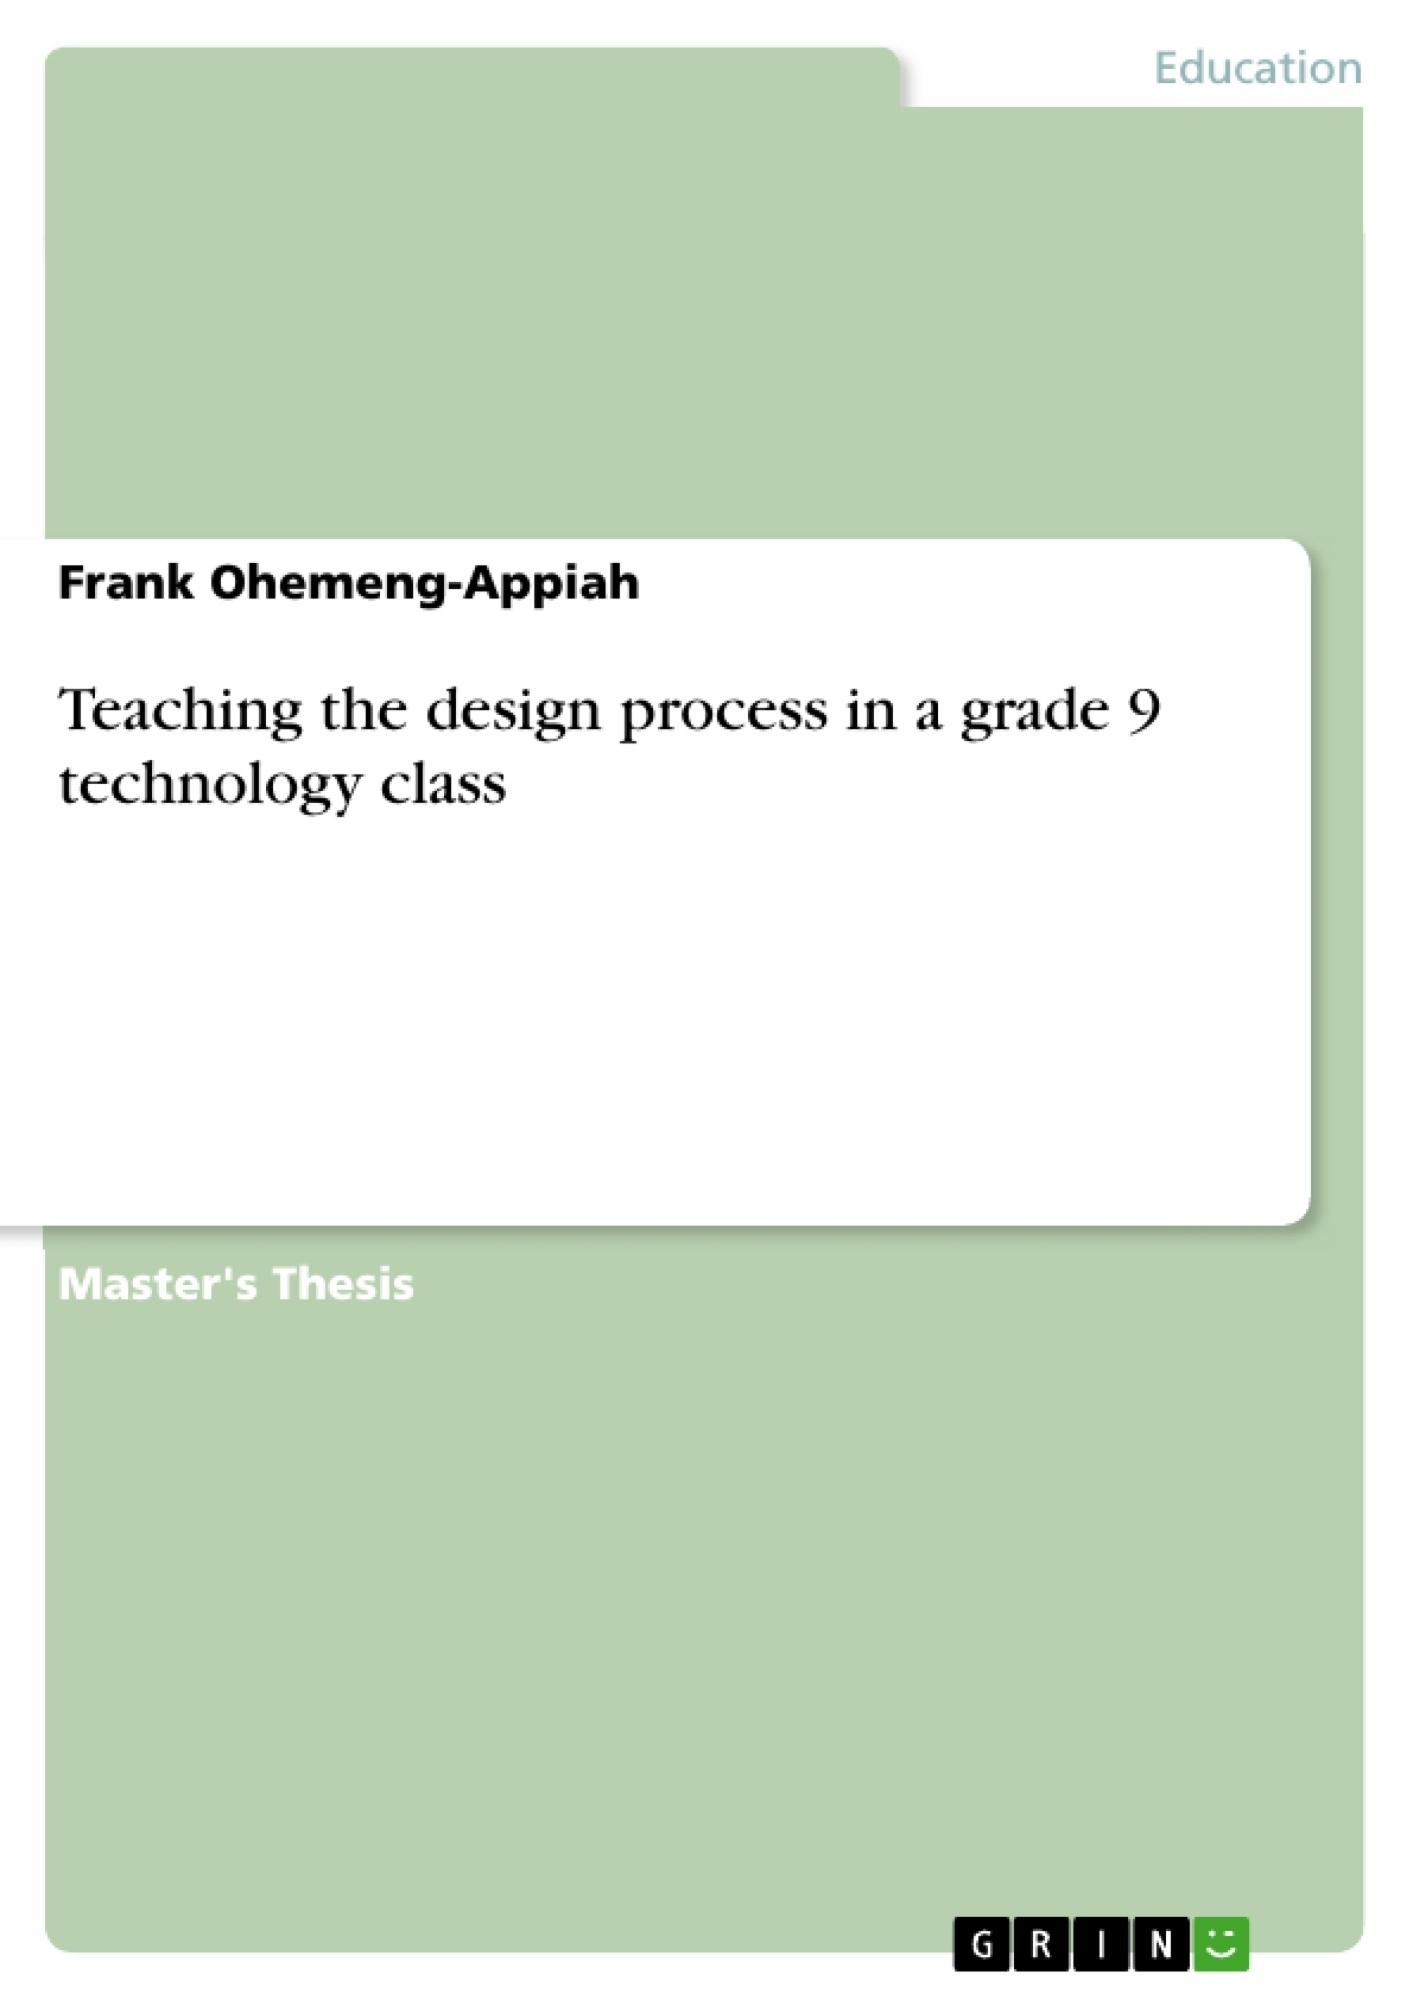 Title: Teaching the design process in a grade 9 technology class